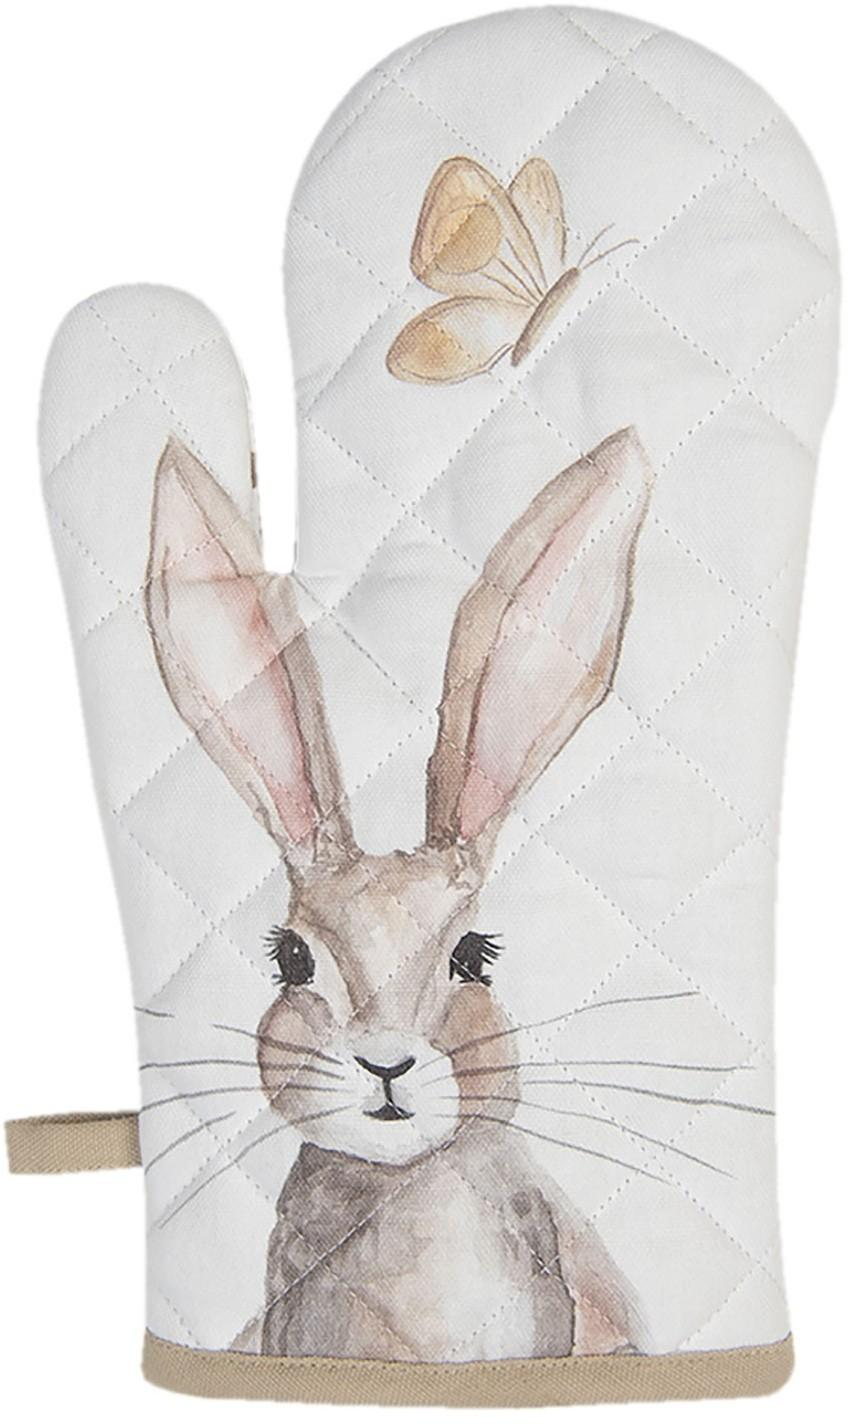 Kuchynská chňapka s motívom králikov Rustic Easter Bunny - 16 * 30 cm